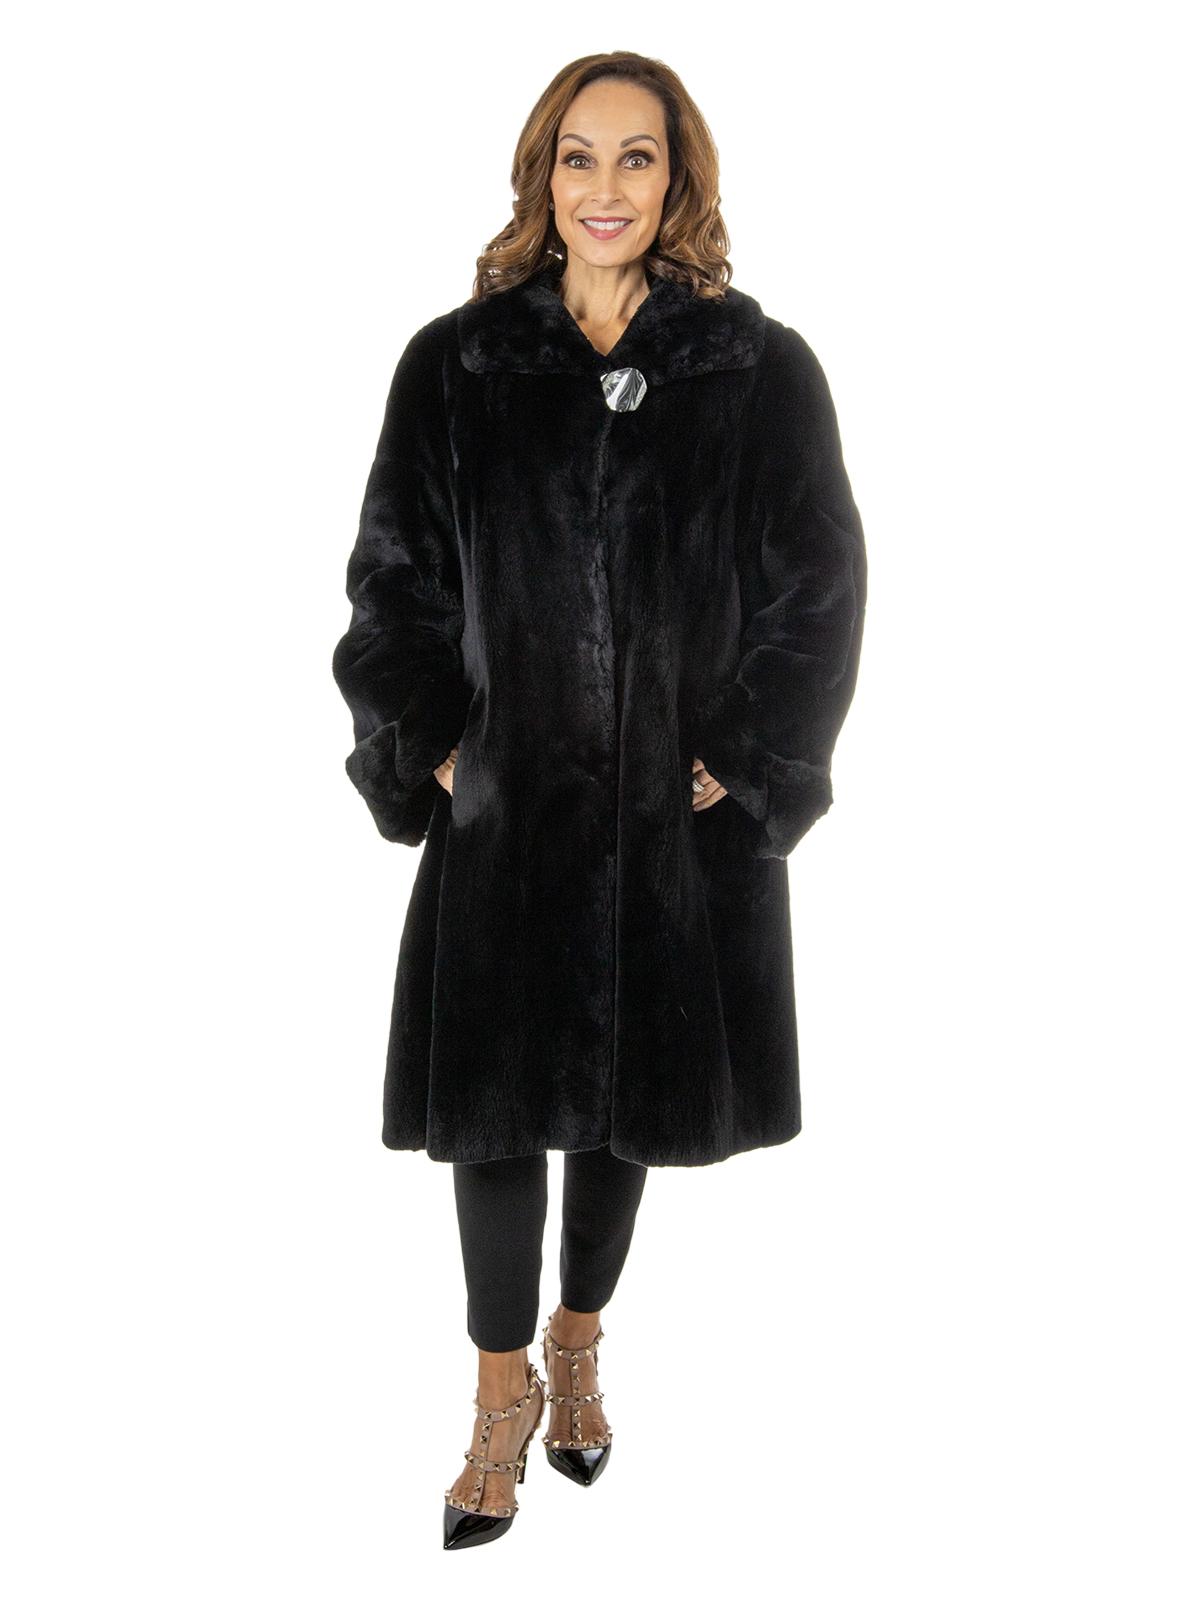 Women's Black Sheared Beaver Fur 3/4 Coat